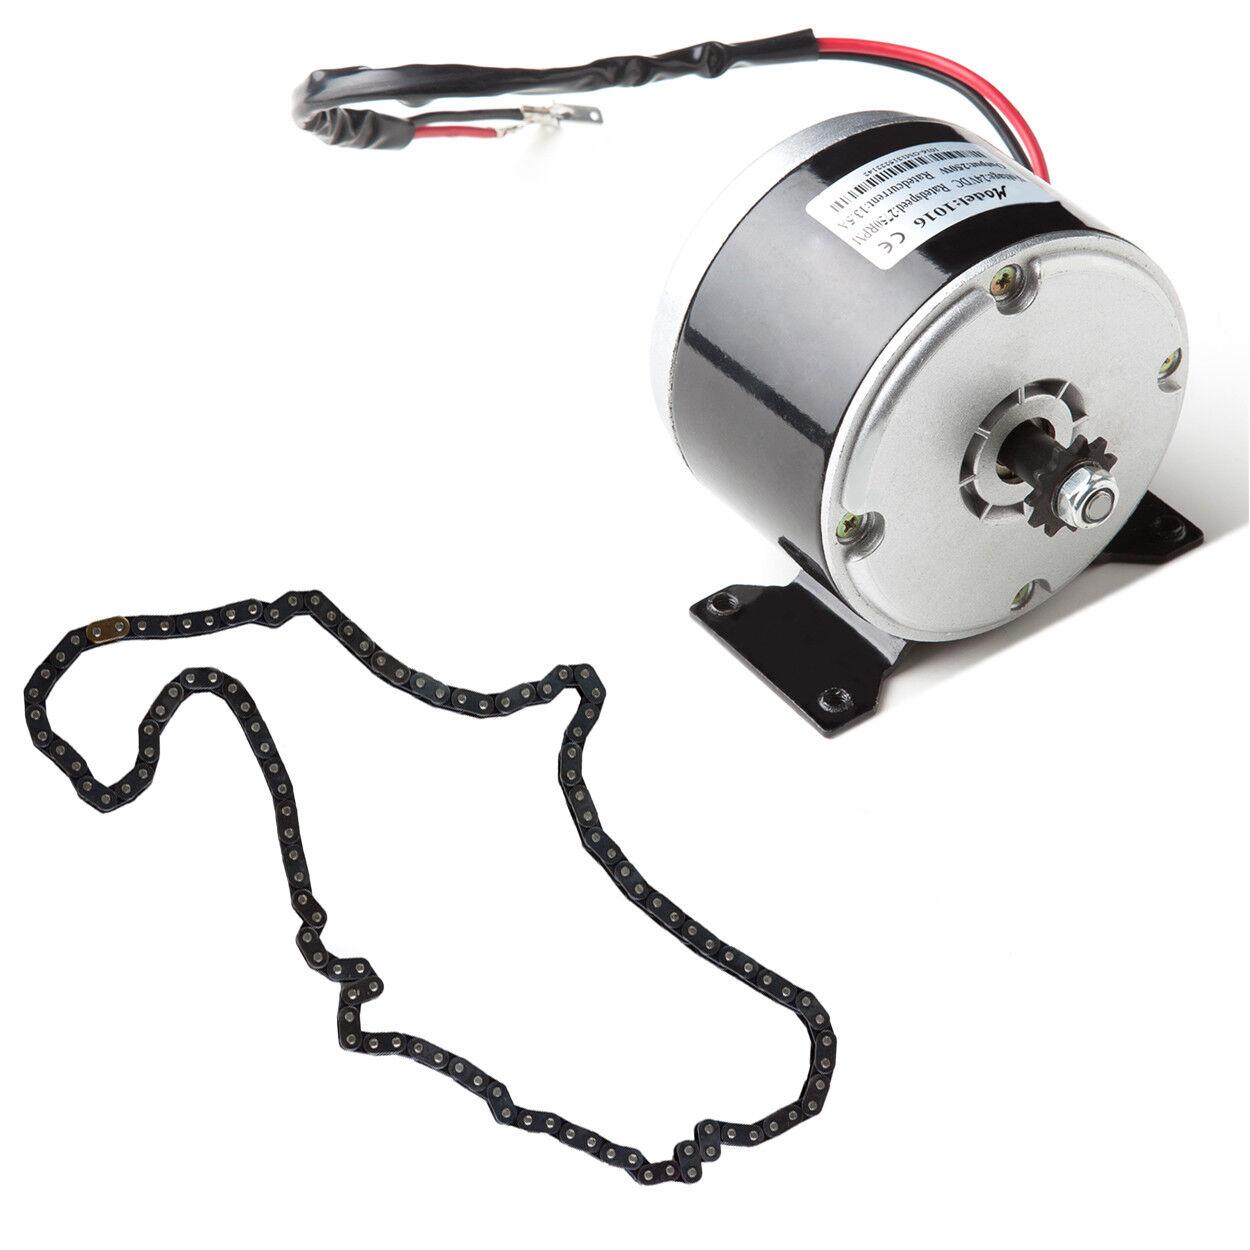 250 W 24 V DC electric 1016 motor+Chain f scooter Go-Kart minibike razor Drifter